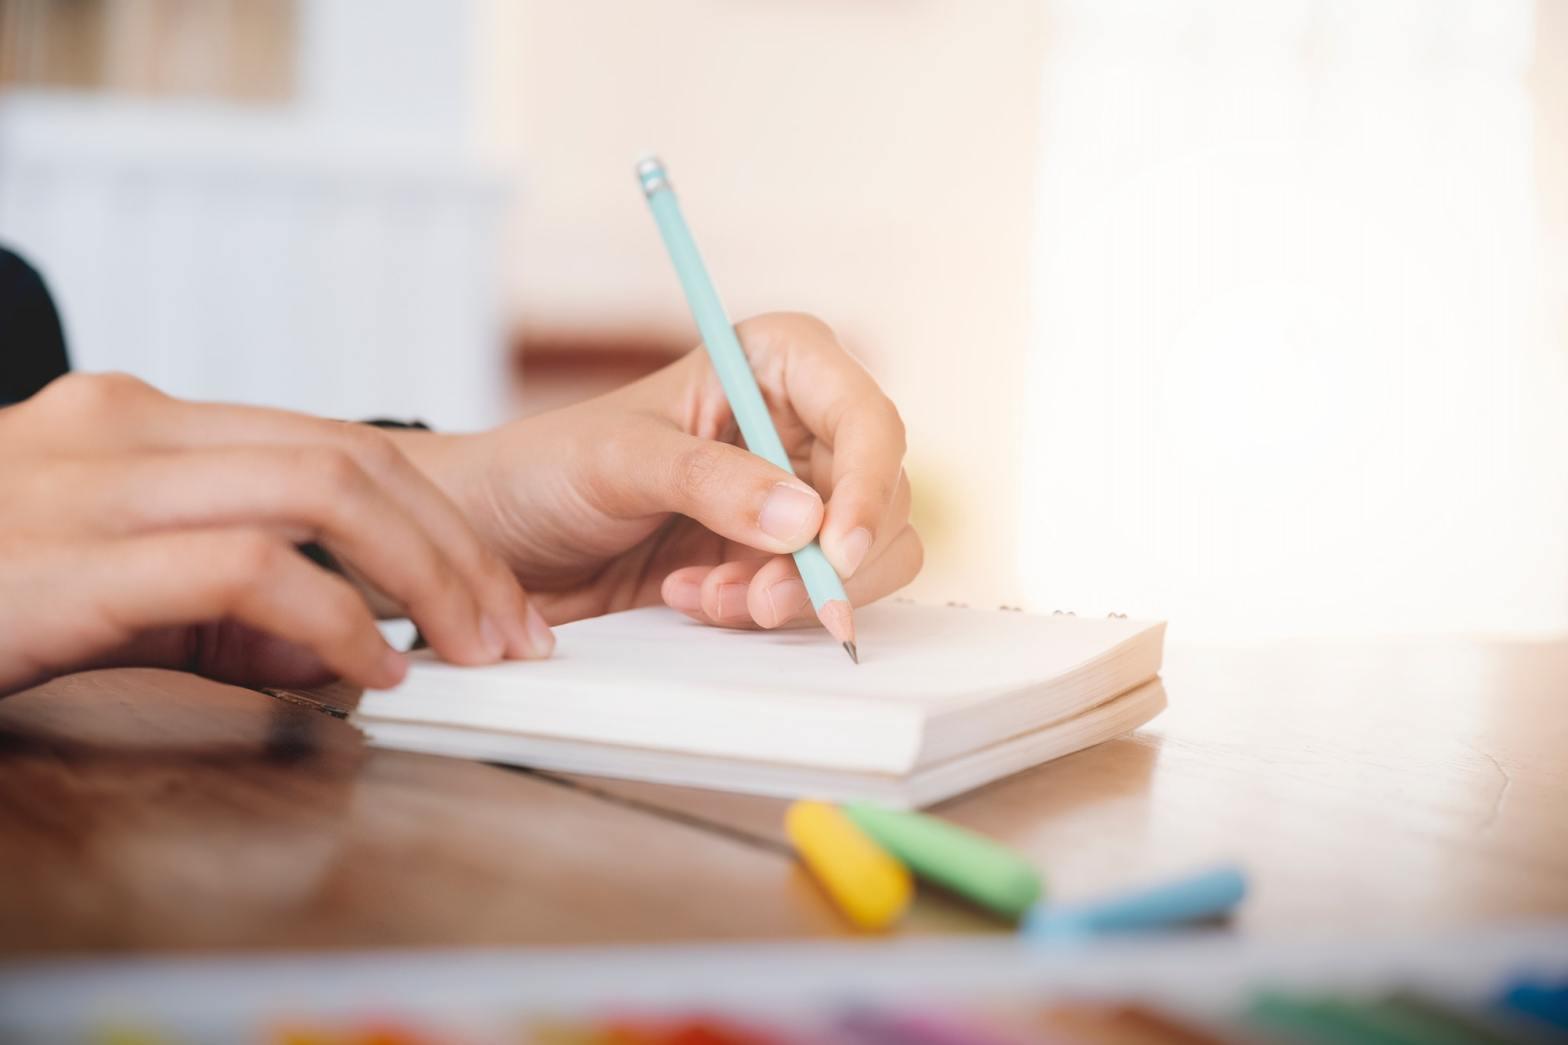 Female hand writing notebook.